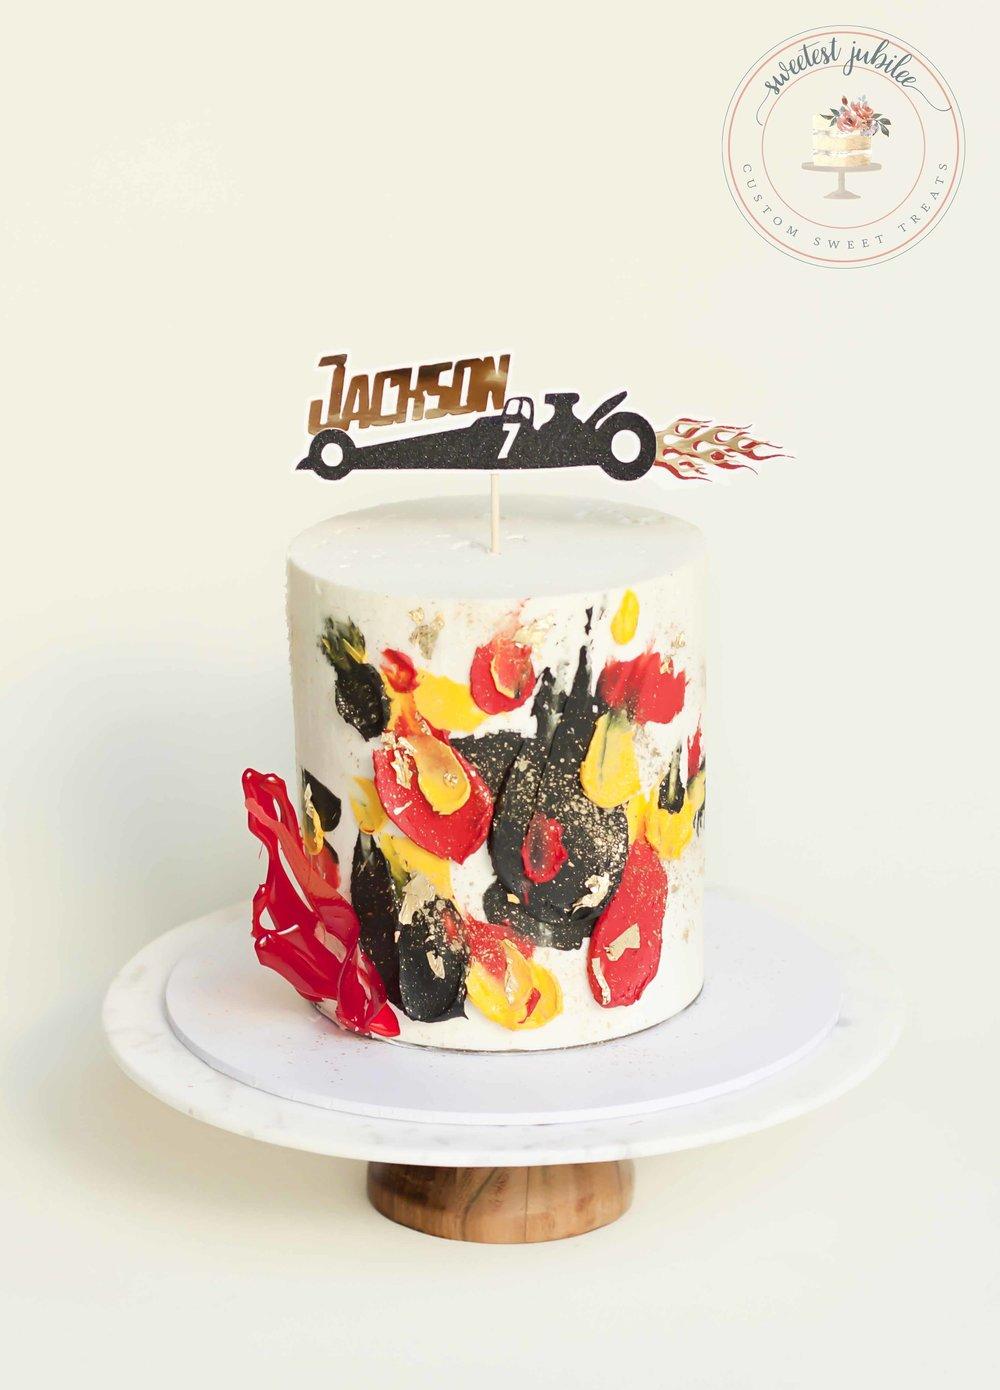 Jackson 7th cake.jpg